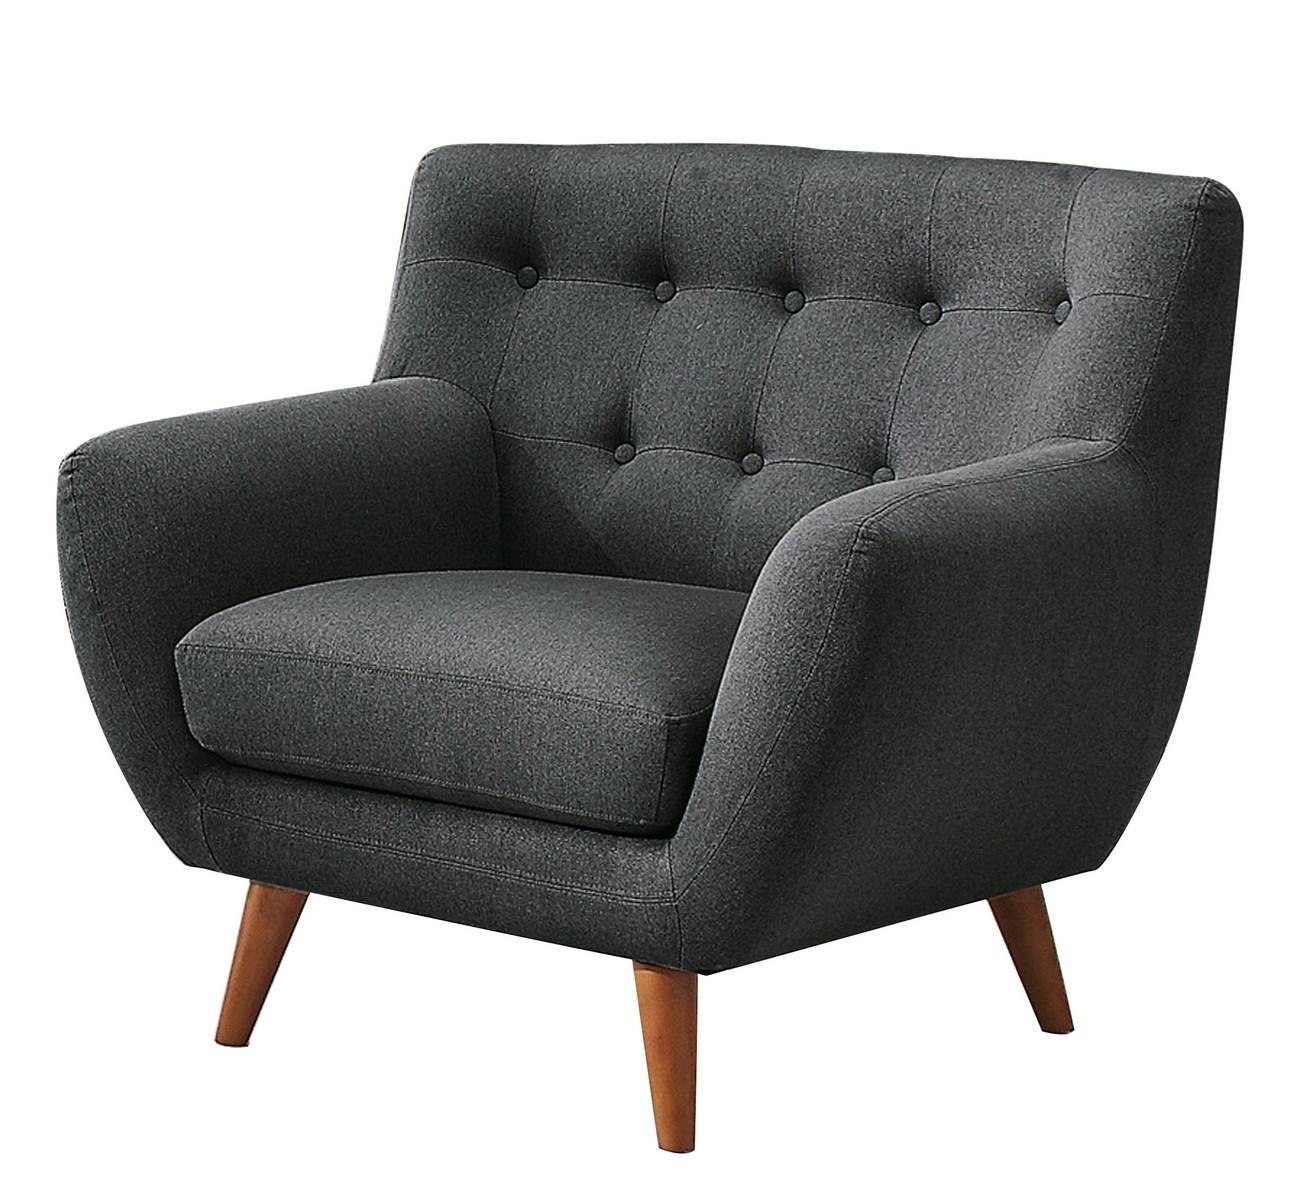 Homelegance Anke Chair - Polyester - Dark Grey